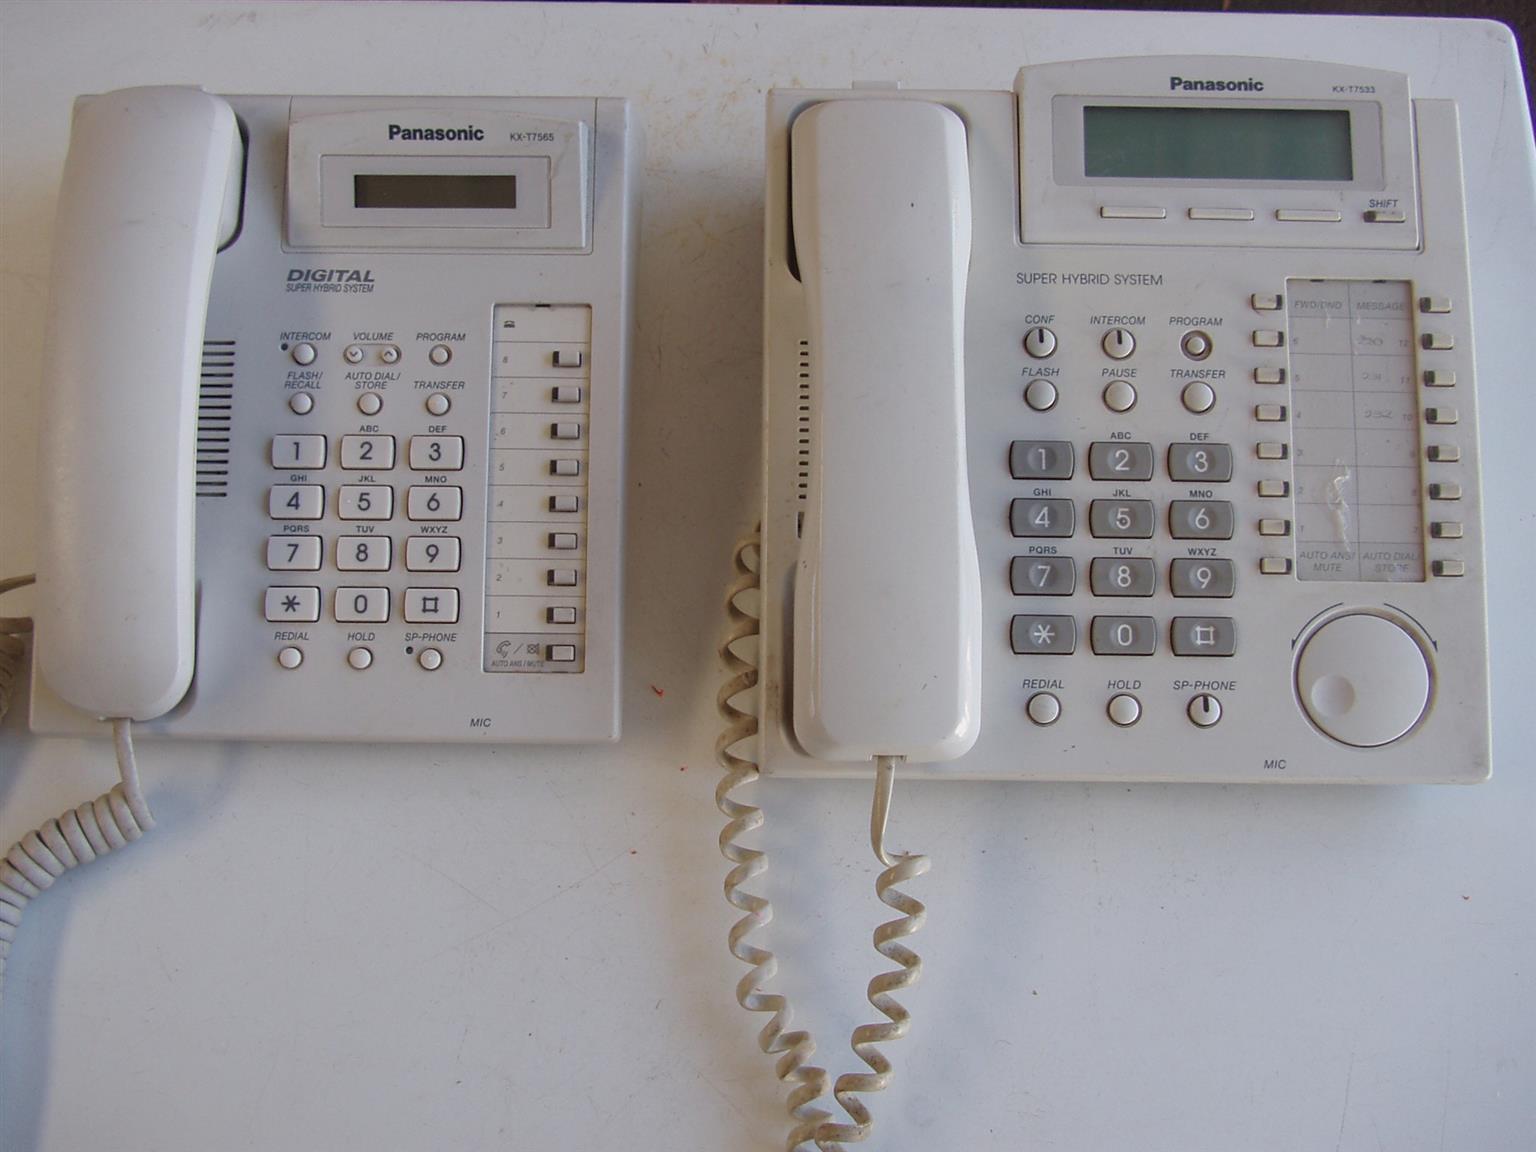 Panasonic KX-T7533  & KX-T7565 - System telephones